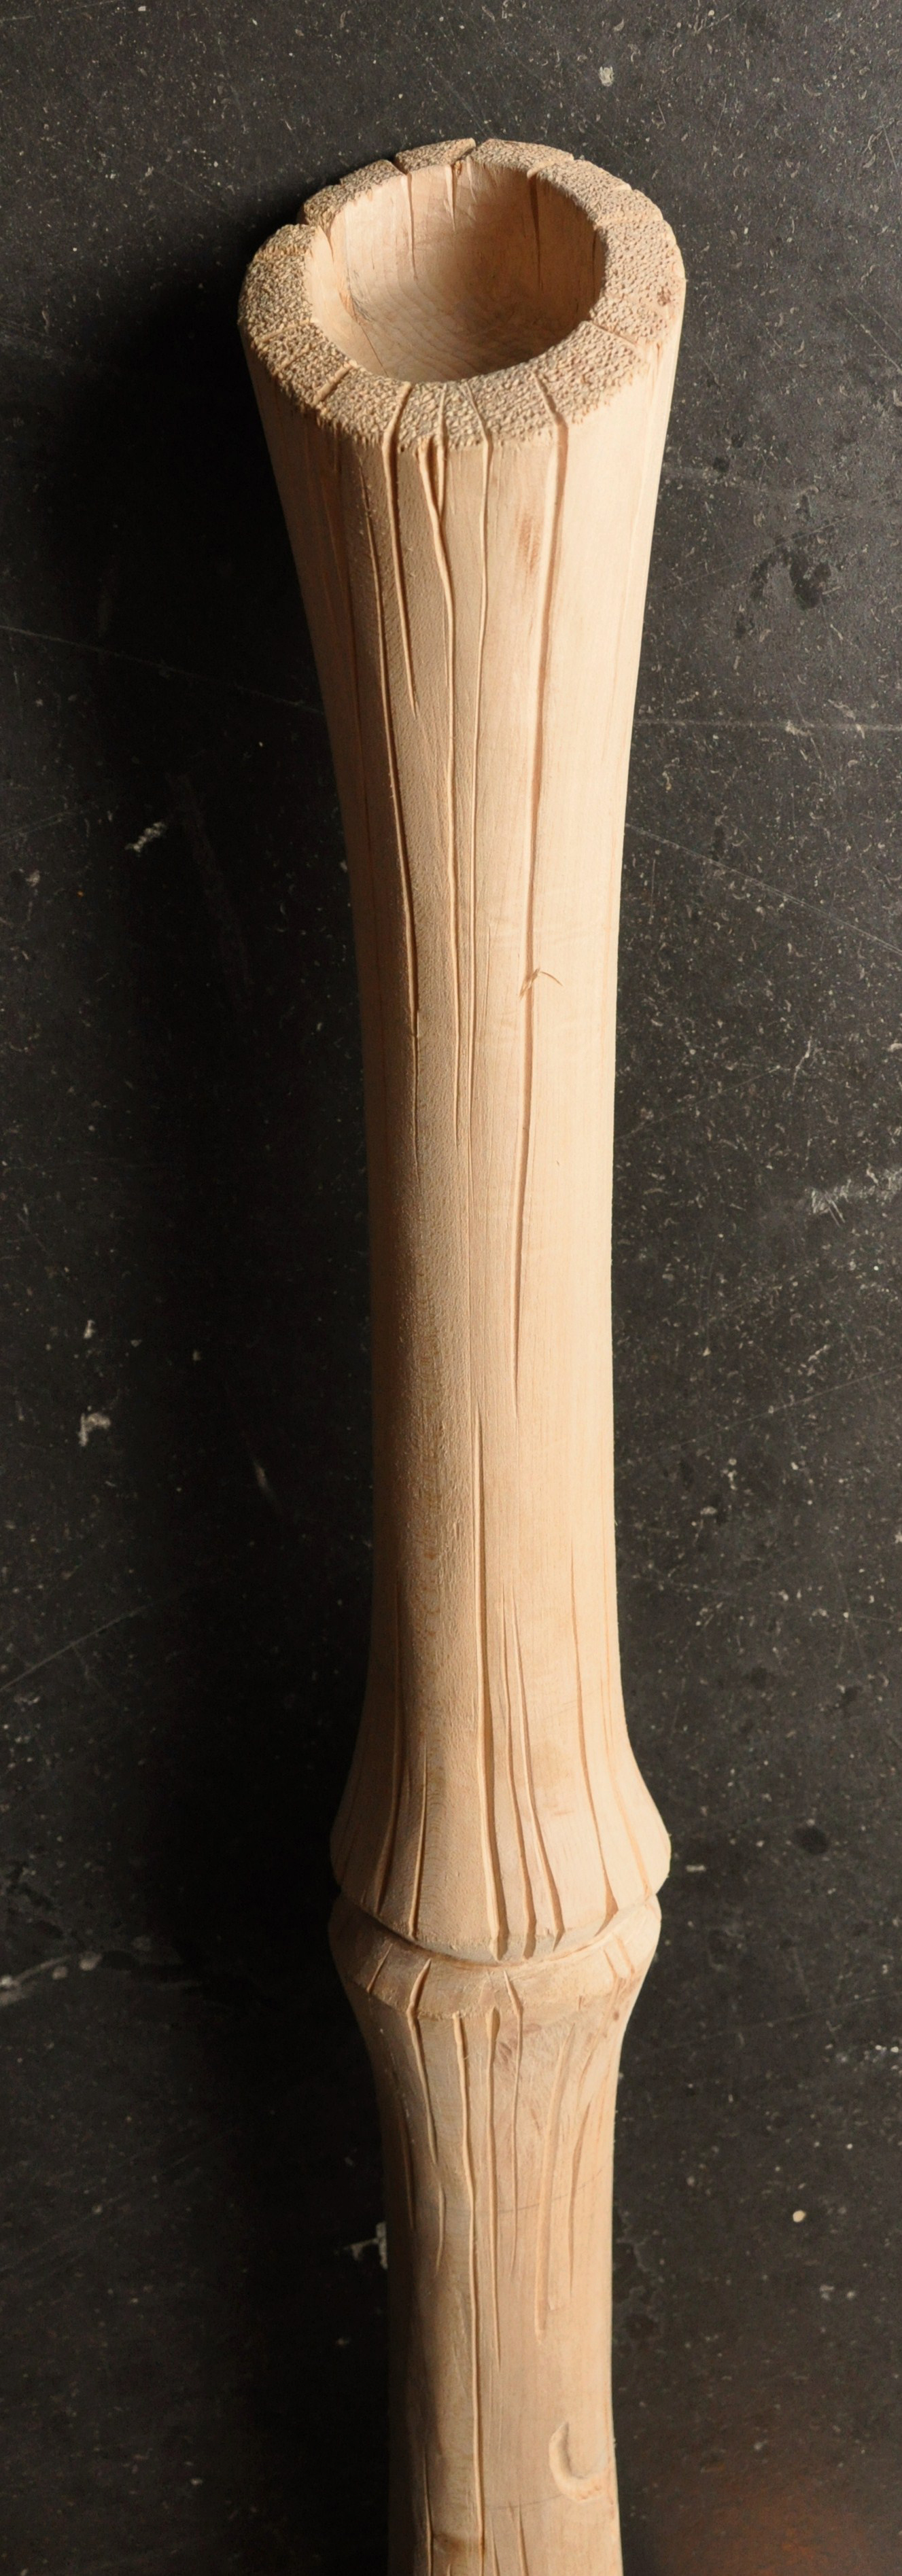 Baton Mits of Pandaria